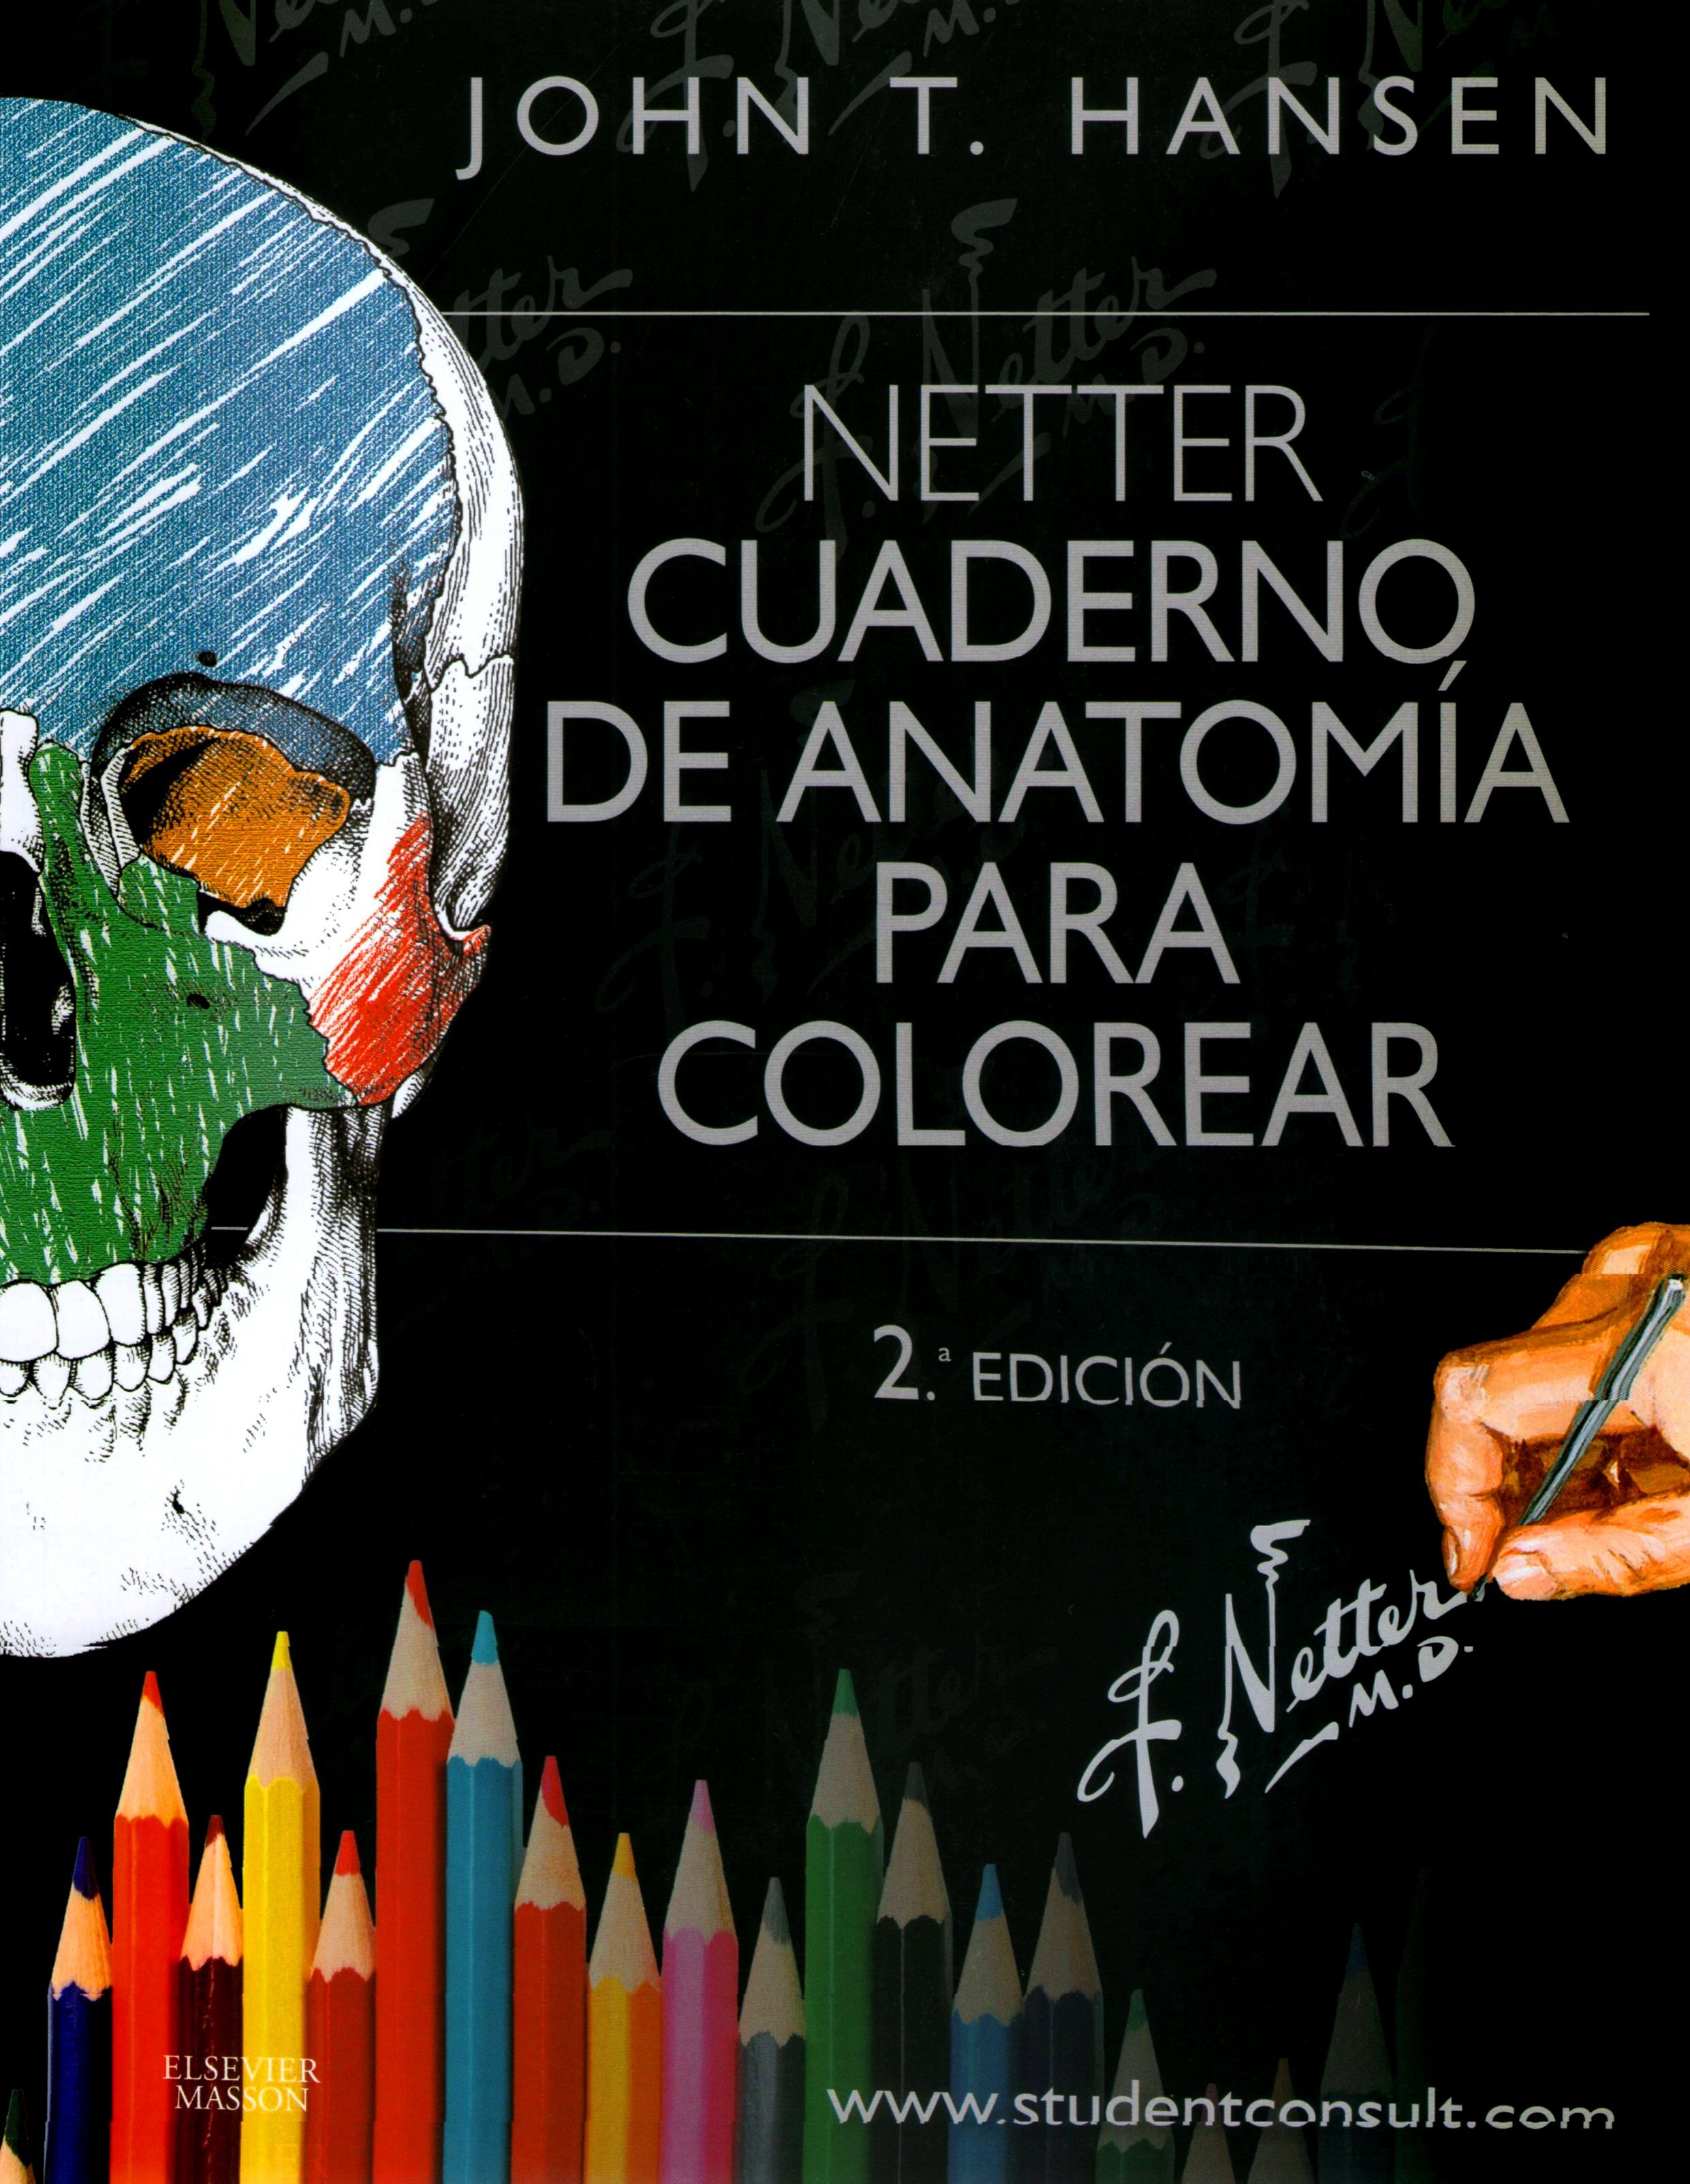 Netter. Cuaderno de anatomia para colorear | Med books | Pinterest ...